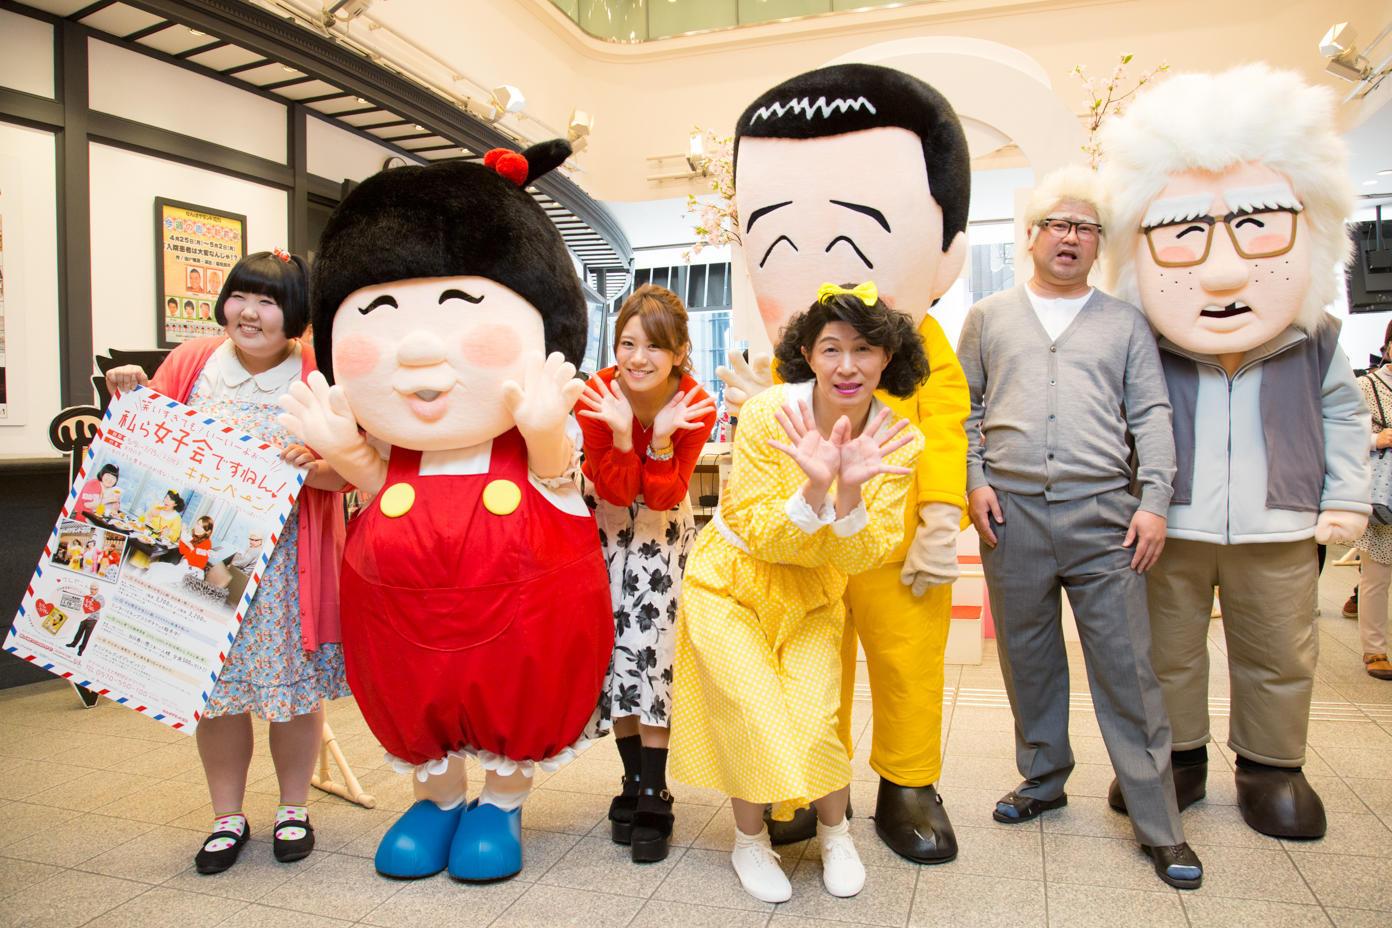 http://news.yoshimoto.co.jp/20160430154606-f51b02d8519794c93a294007152981ae3ece3d6d.jpg